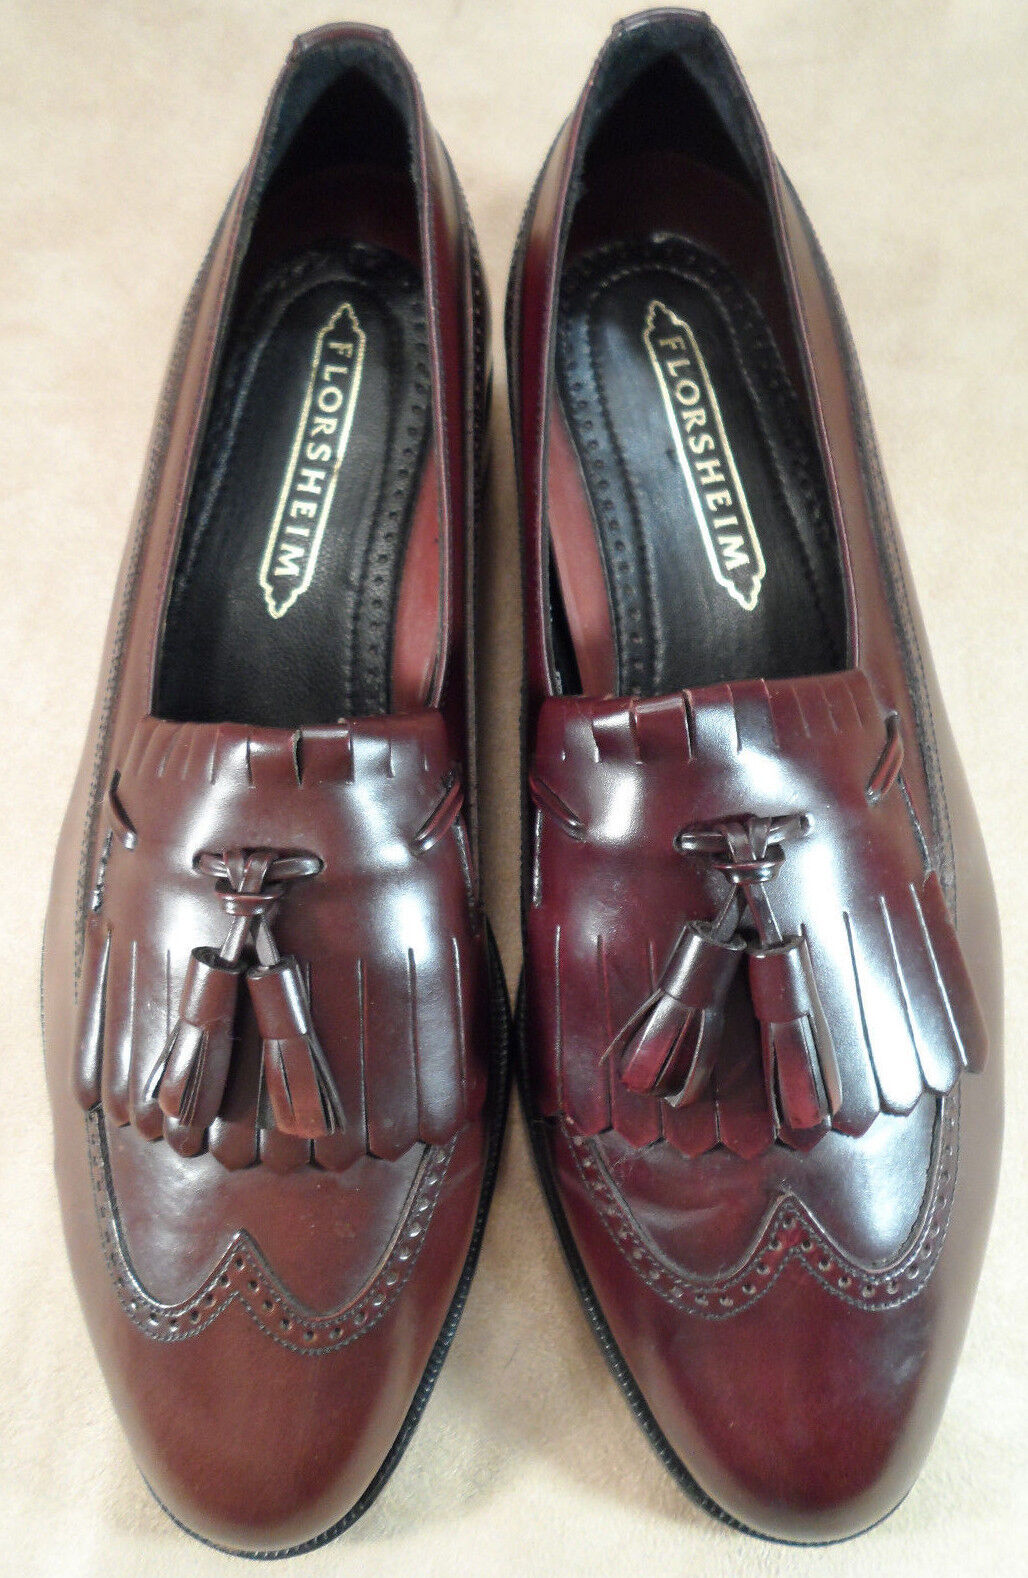 Florsheim Burgundy Cordovan Tassel Kilt Loafers shoes -- Sz 7.5 D -- EUC